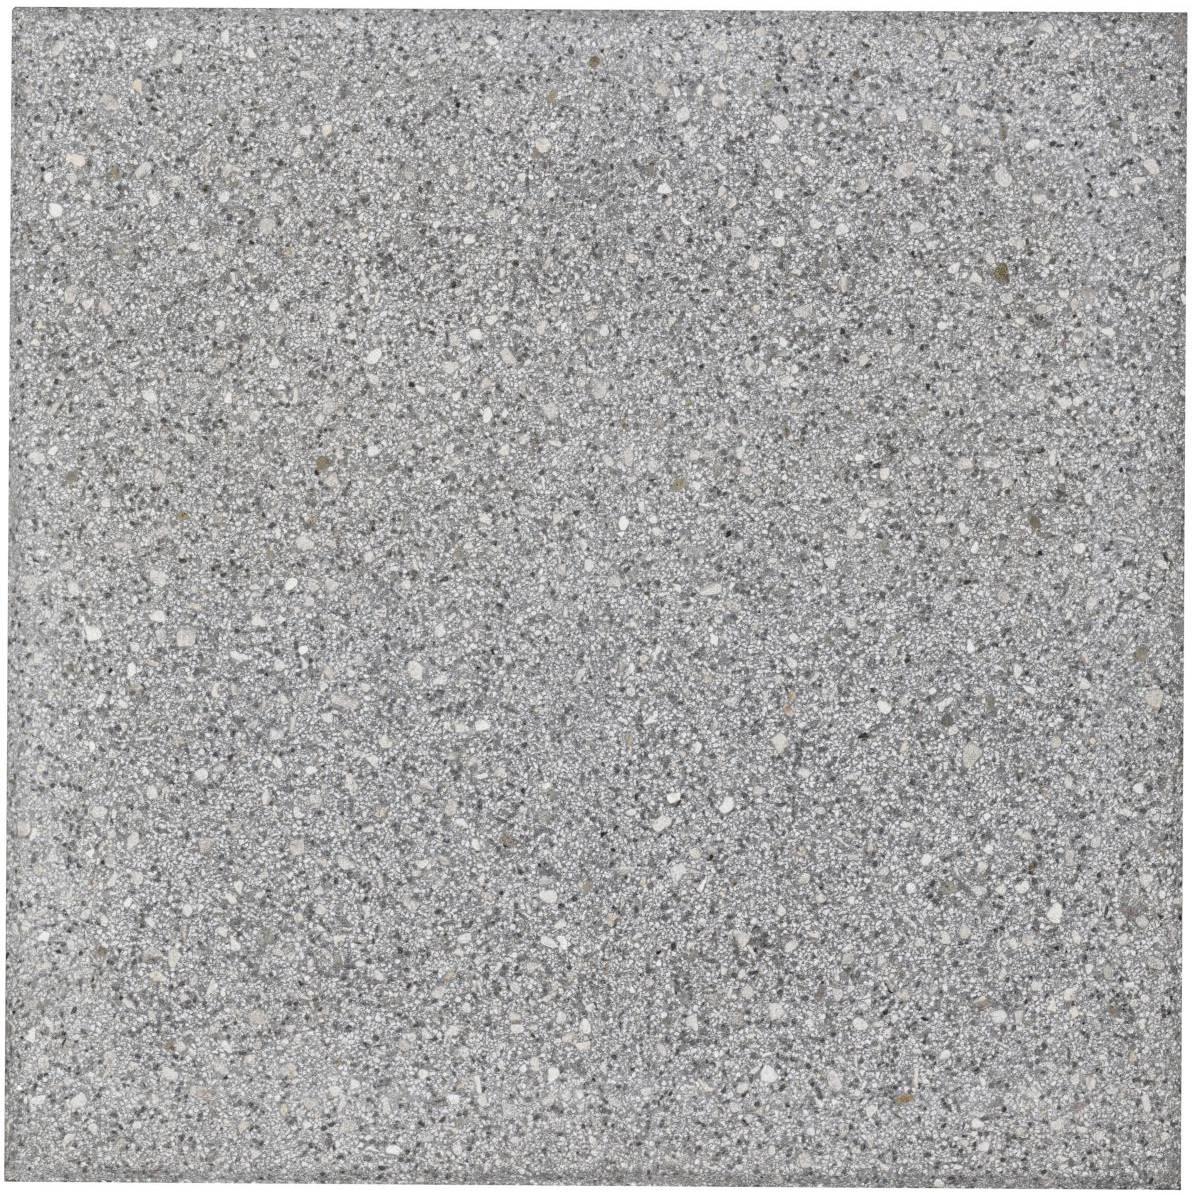 1666 Maspe betonske plosce siligranit peskana prana dvorisce terasa S1.168 uai